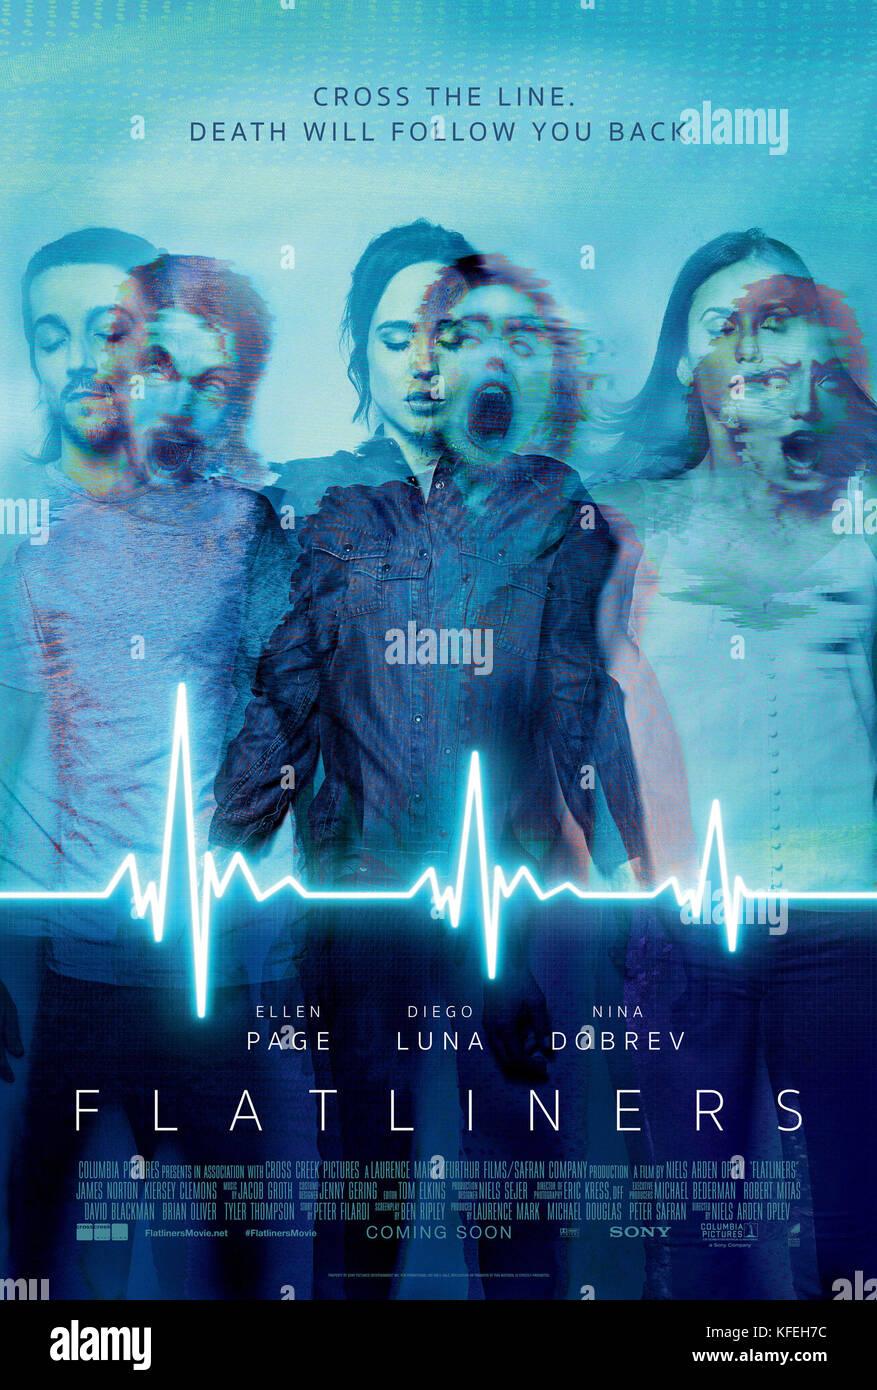 RELEASE DATE: September 29, 2017 TITLE: Flatliners STUDIO: Columbia Pictures. DIRECTOR: Niels Arden Oplev. PLOT: - Stock Image